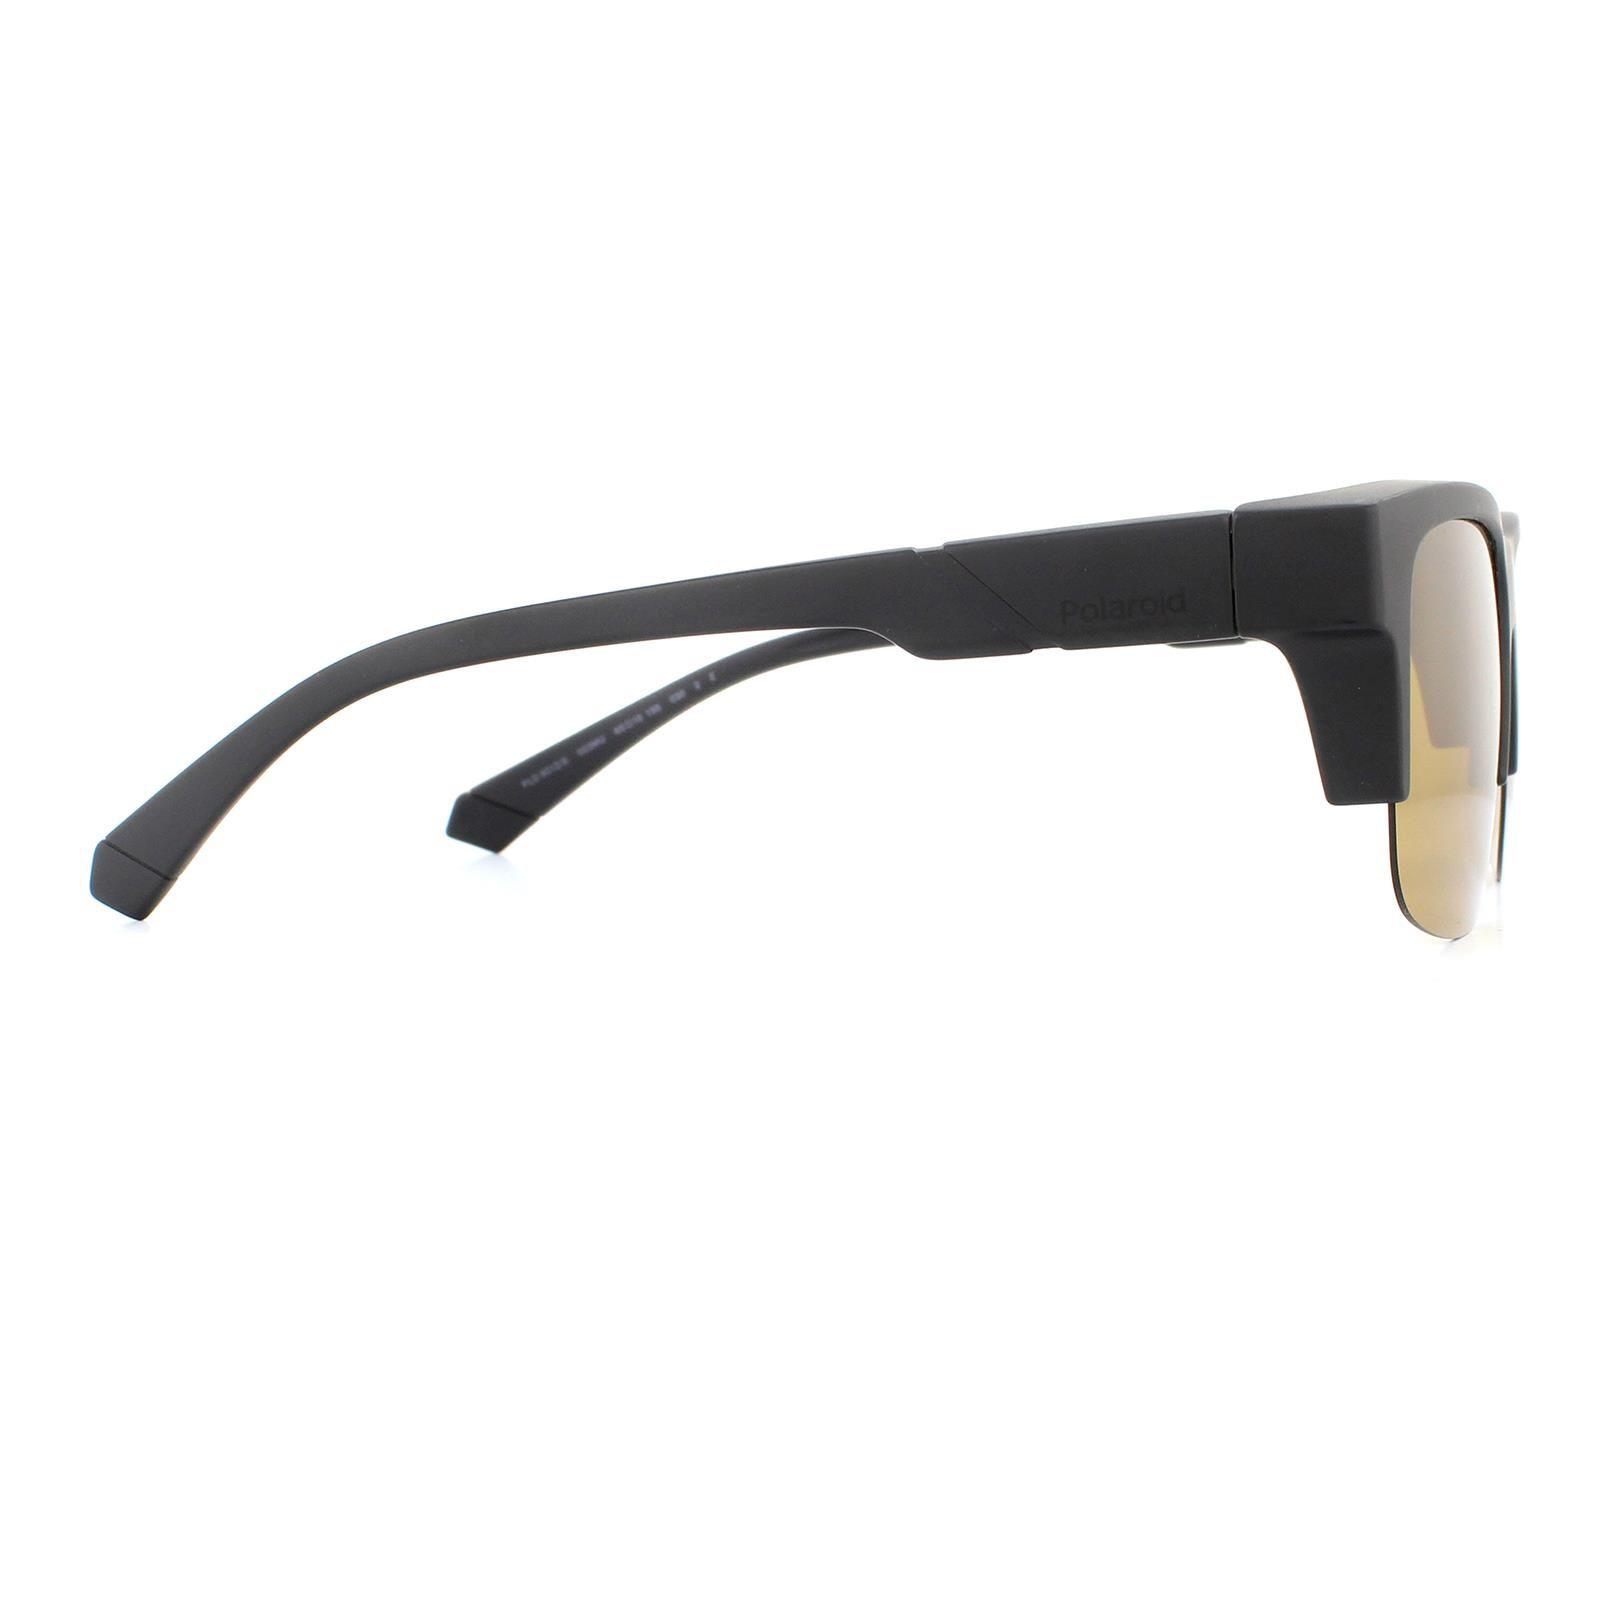 Polaroid Suncovers Sunglasses PLD 9012/S 003 MU Black Yellow Polarized